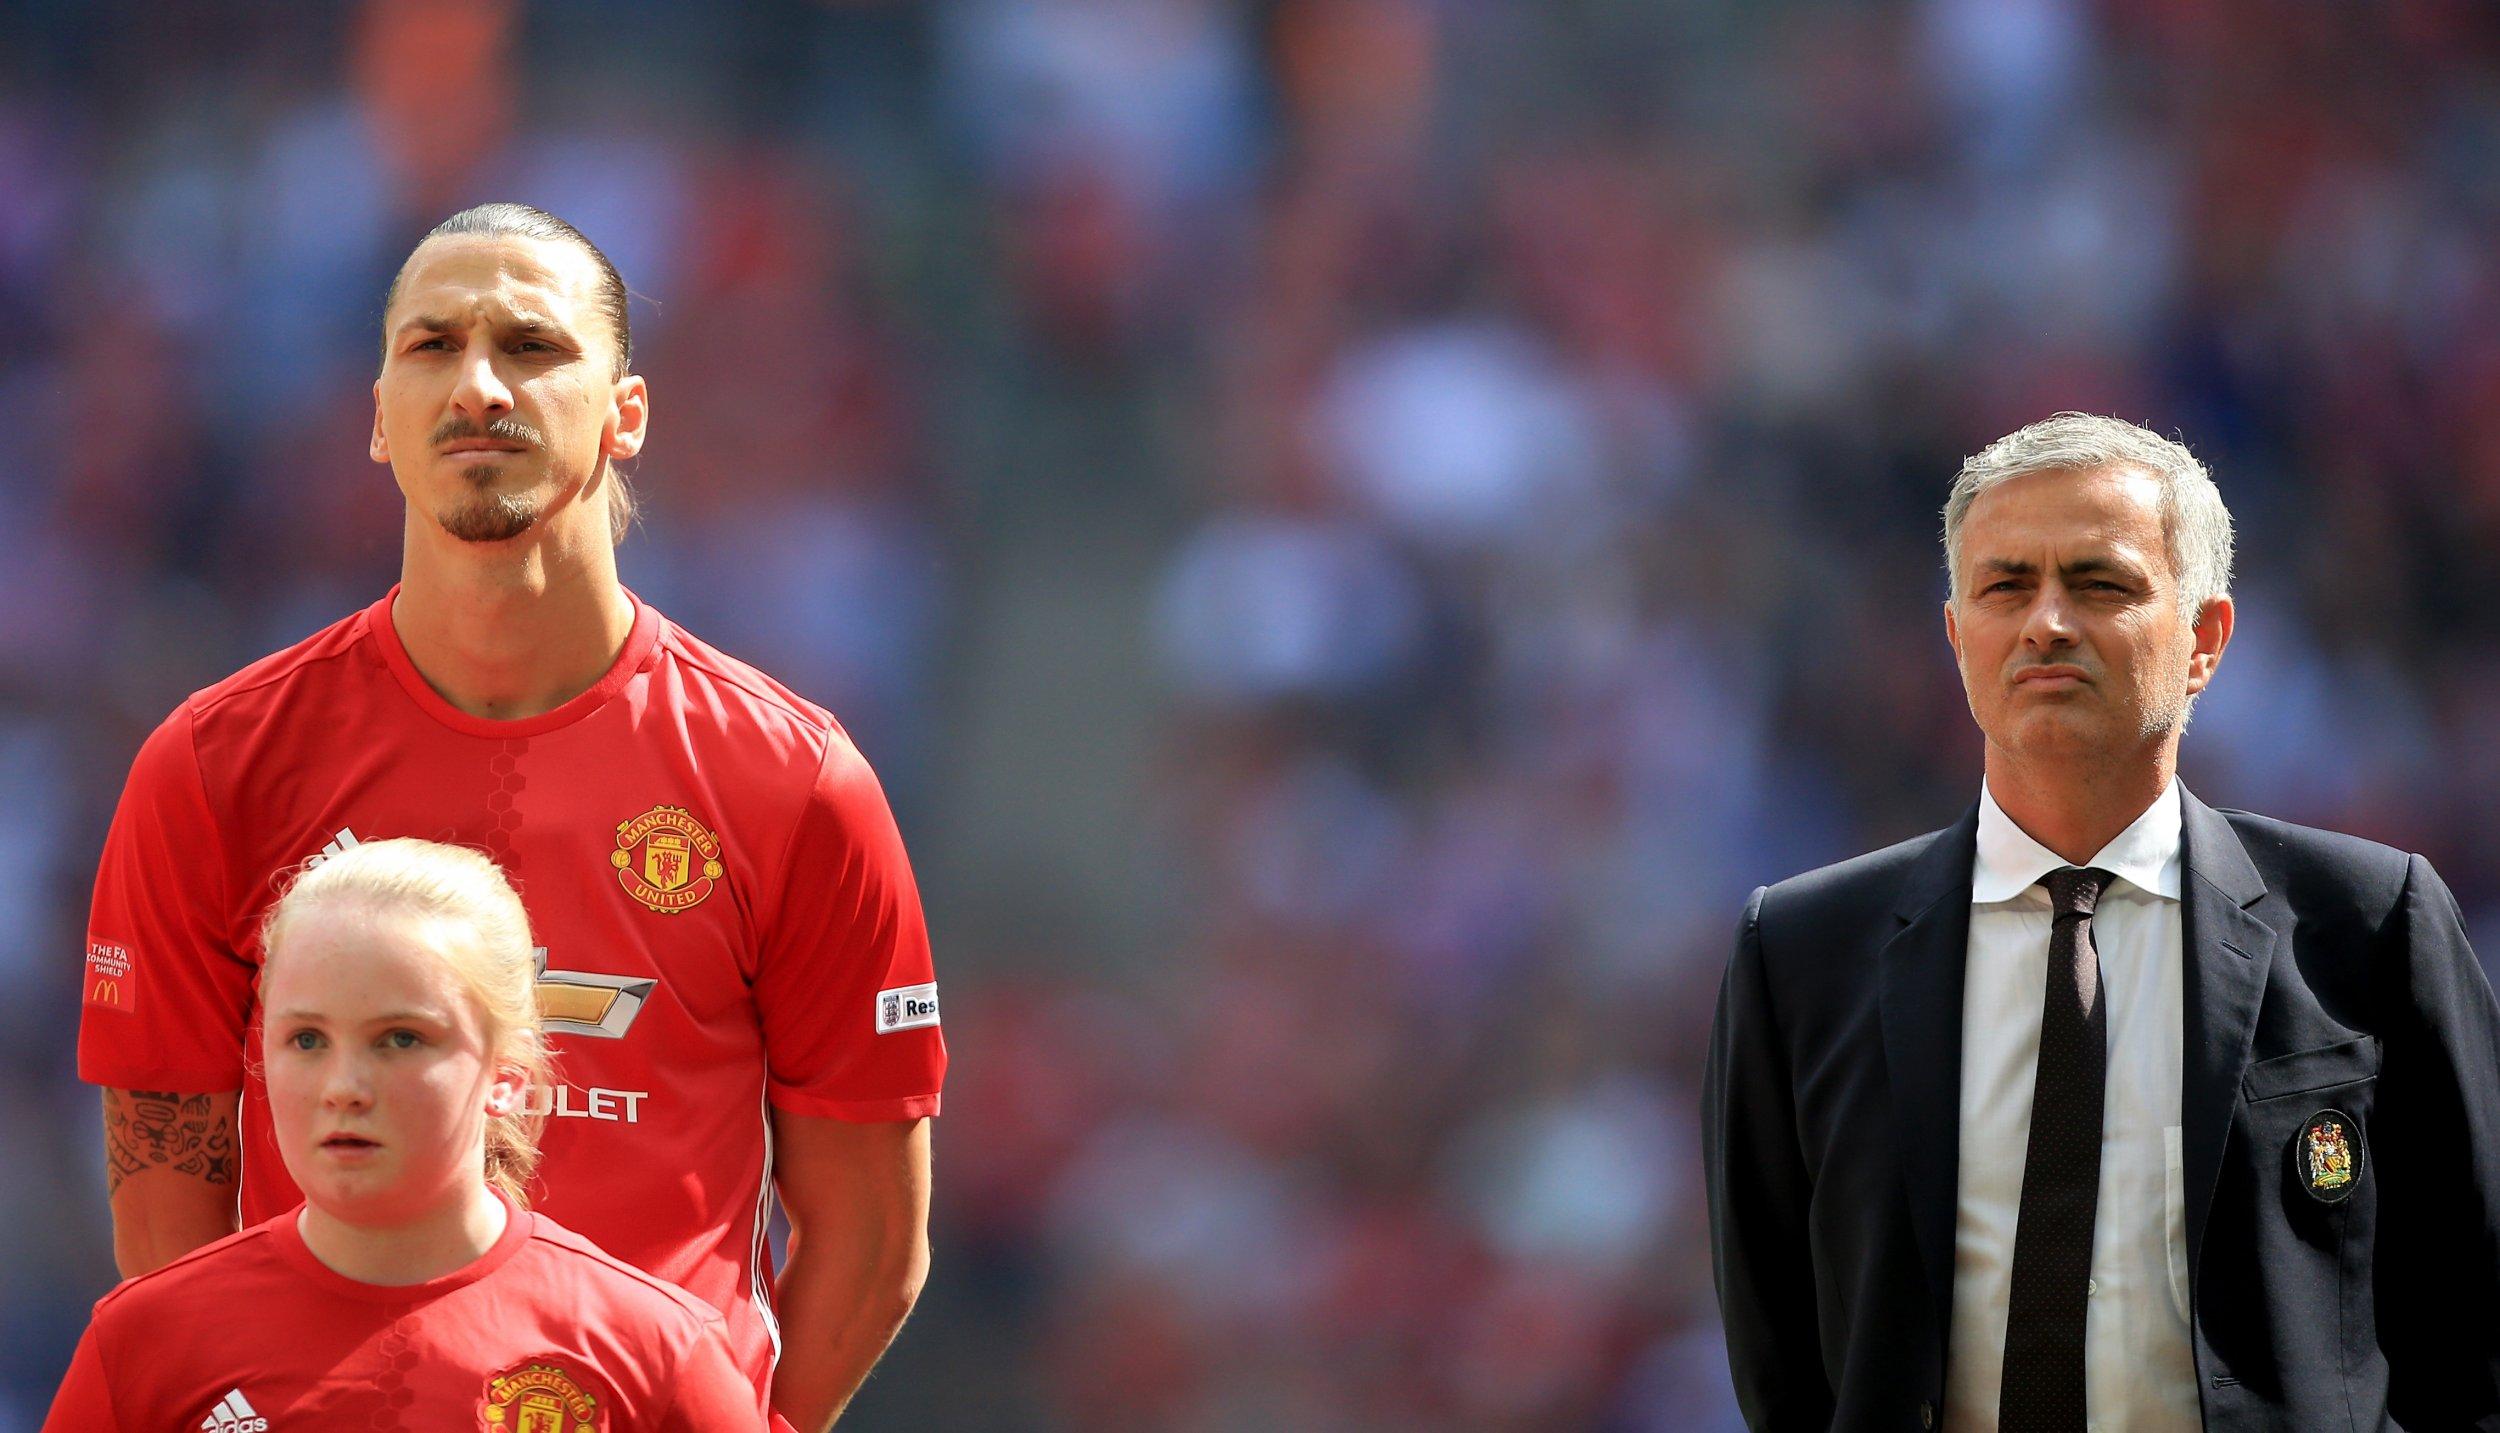 Manchester United Jose Mourinho Celebrates First Trophy At Wembley Stadium